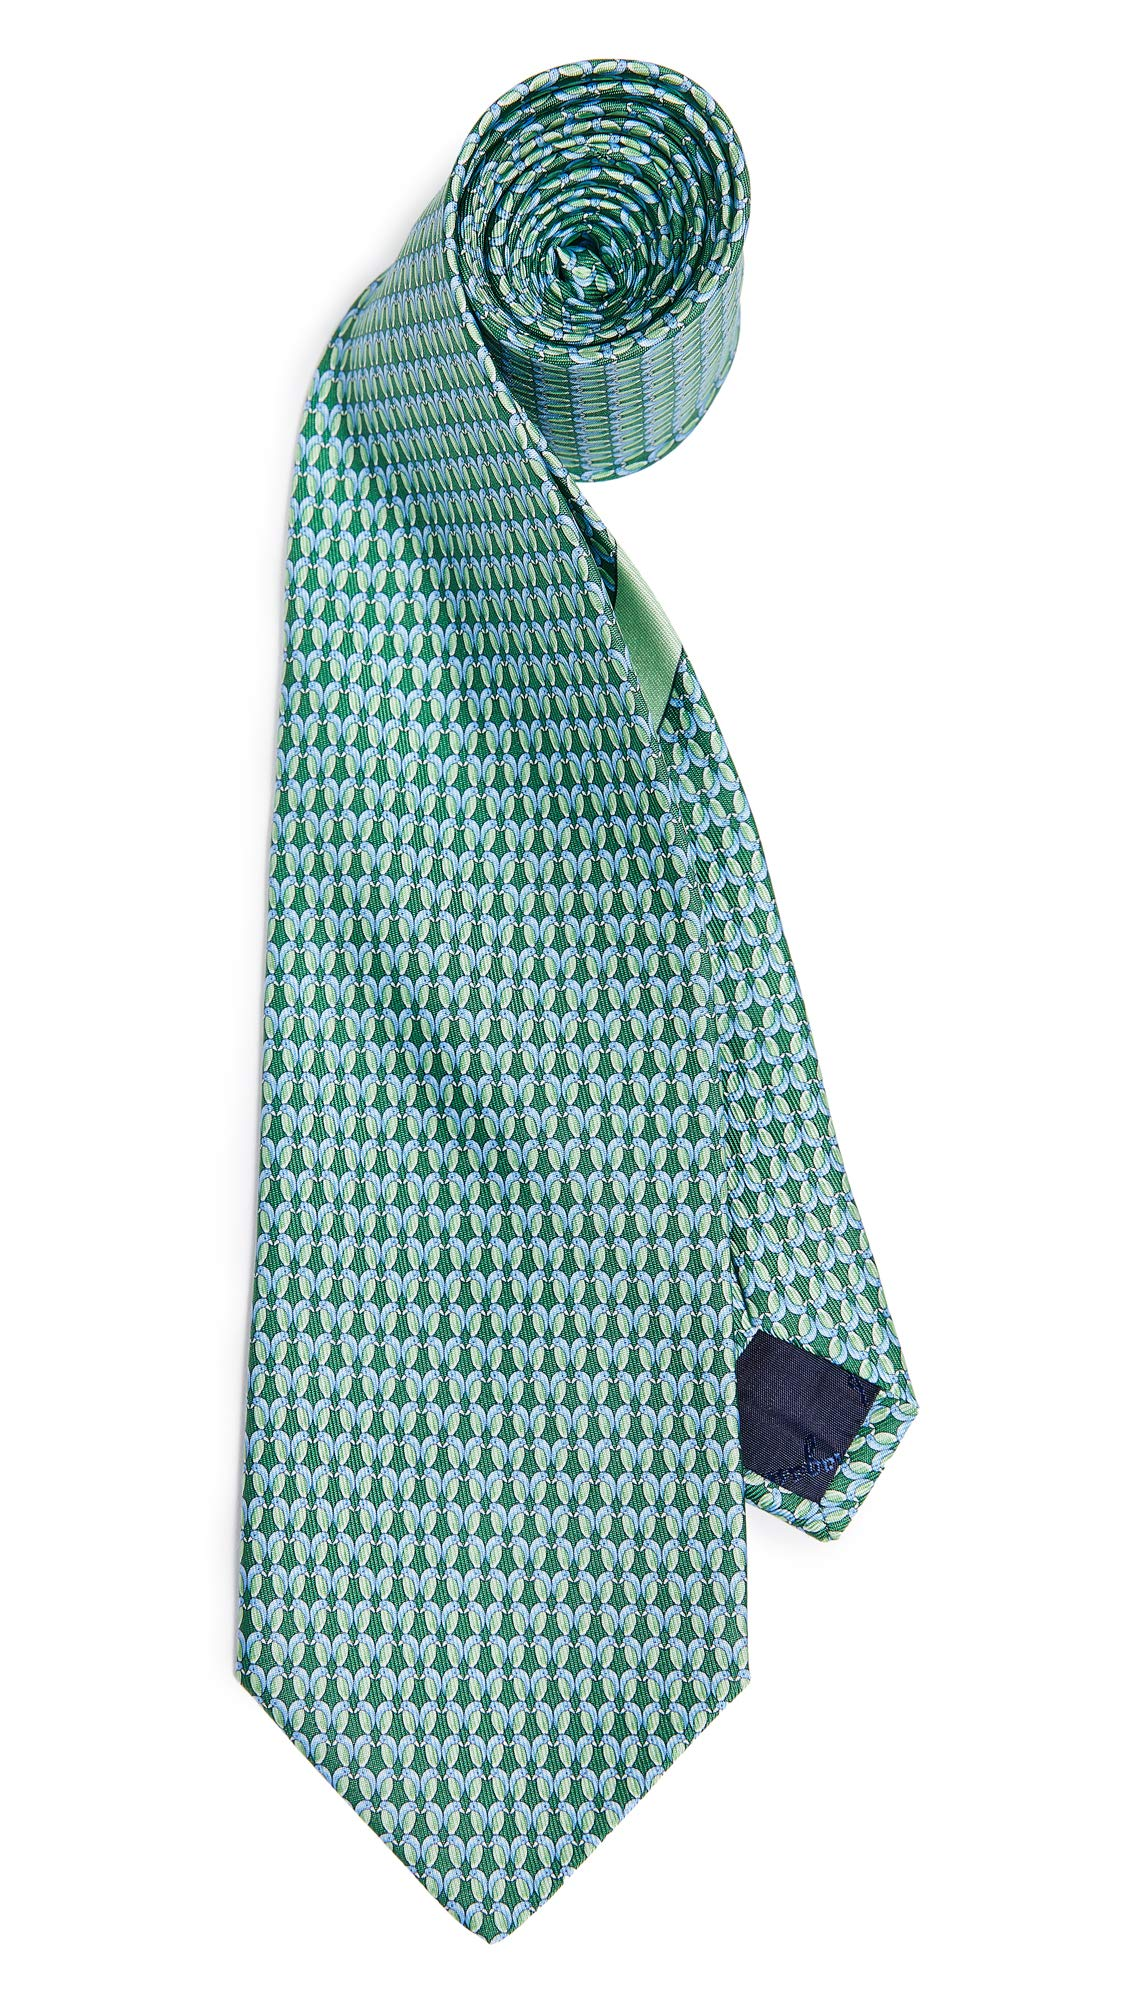 Salvatore Ferragamo Men's Bird Tie, Green, One Size